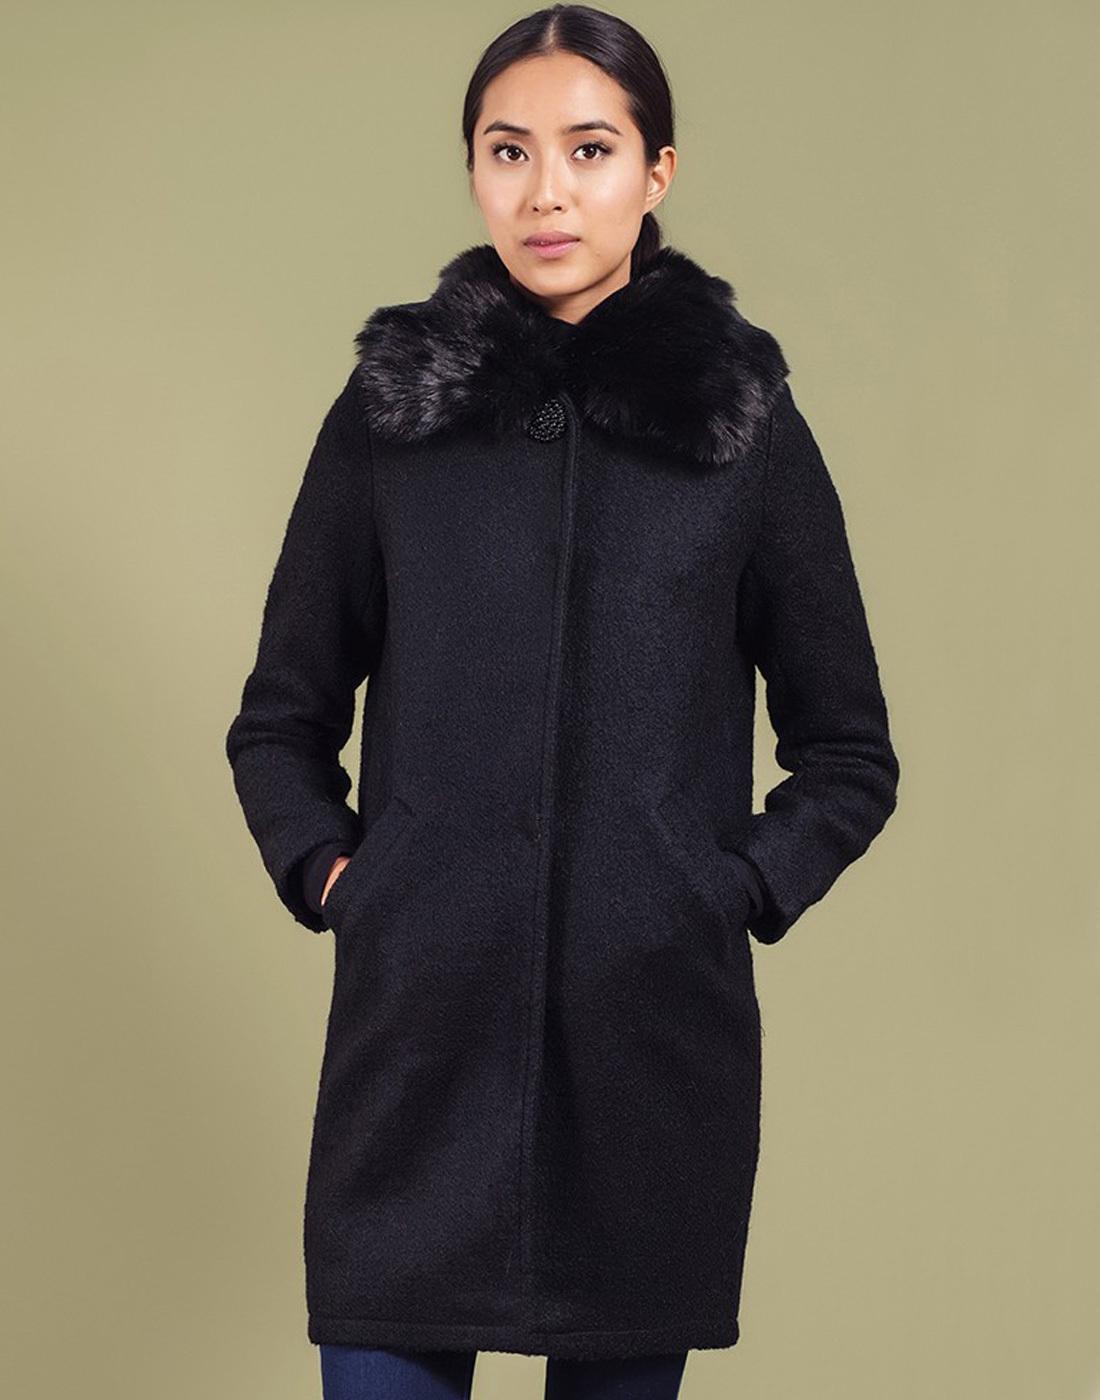 Maddie DARLING Retro Vintage Faux Fur Trim Coat